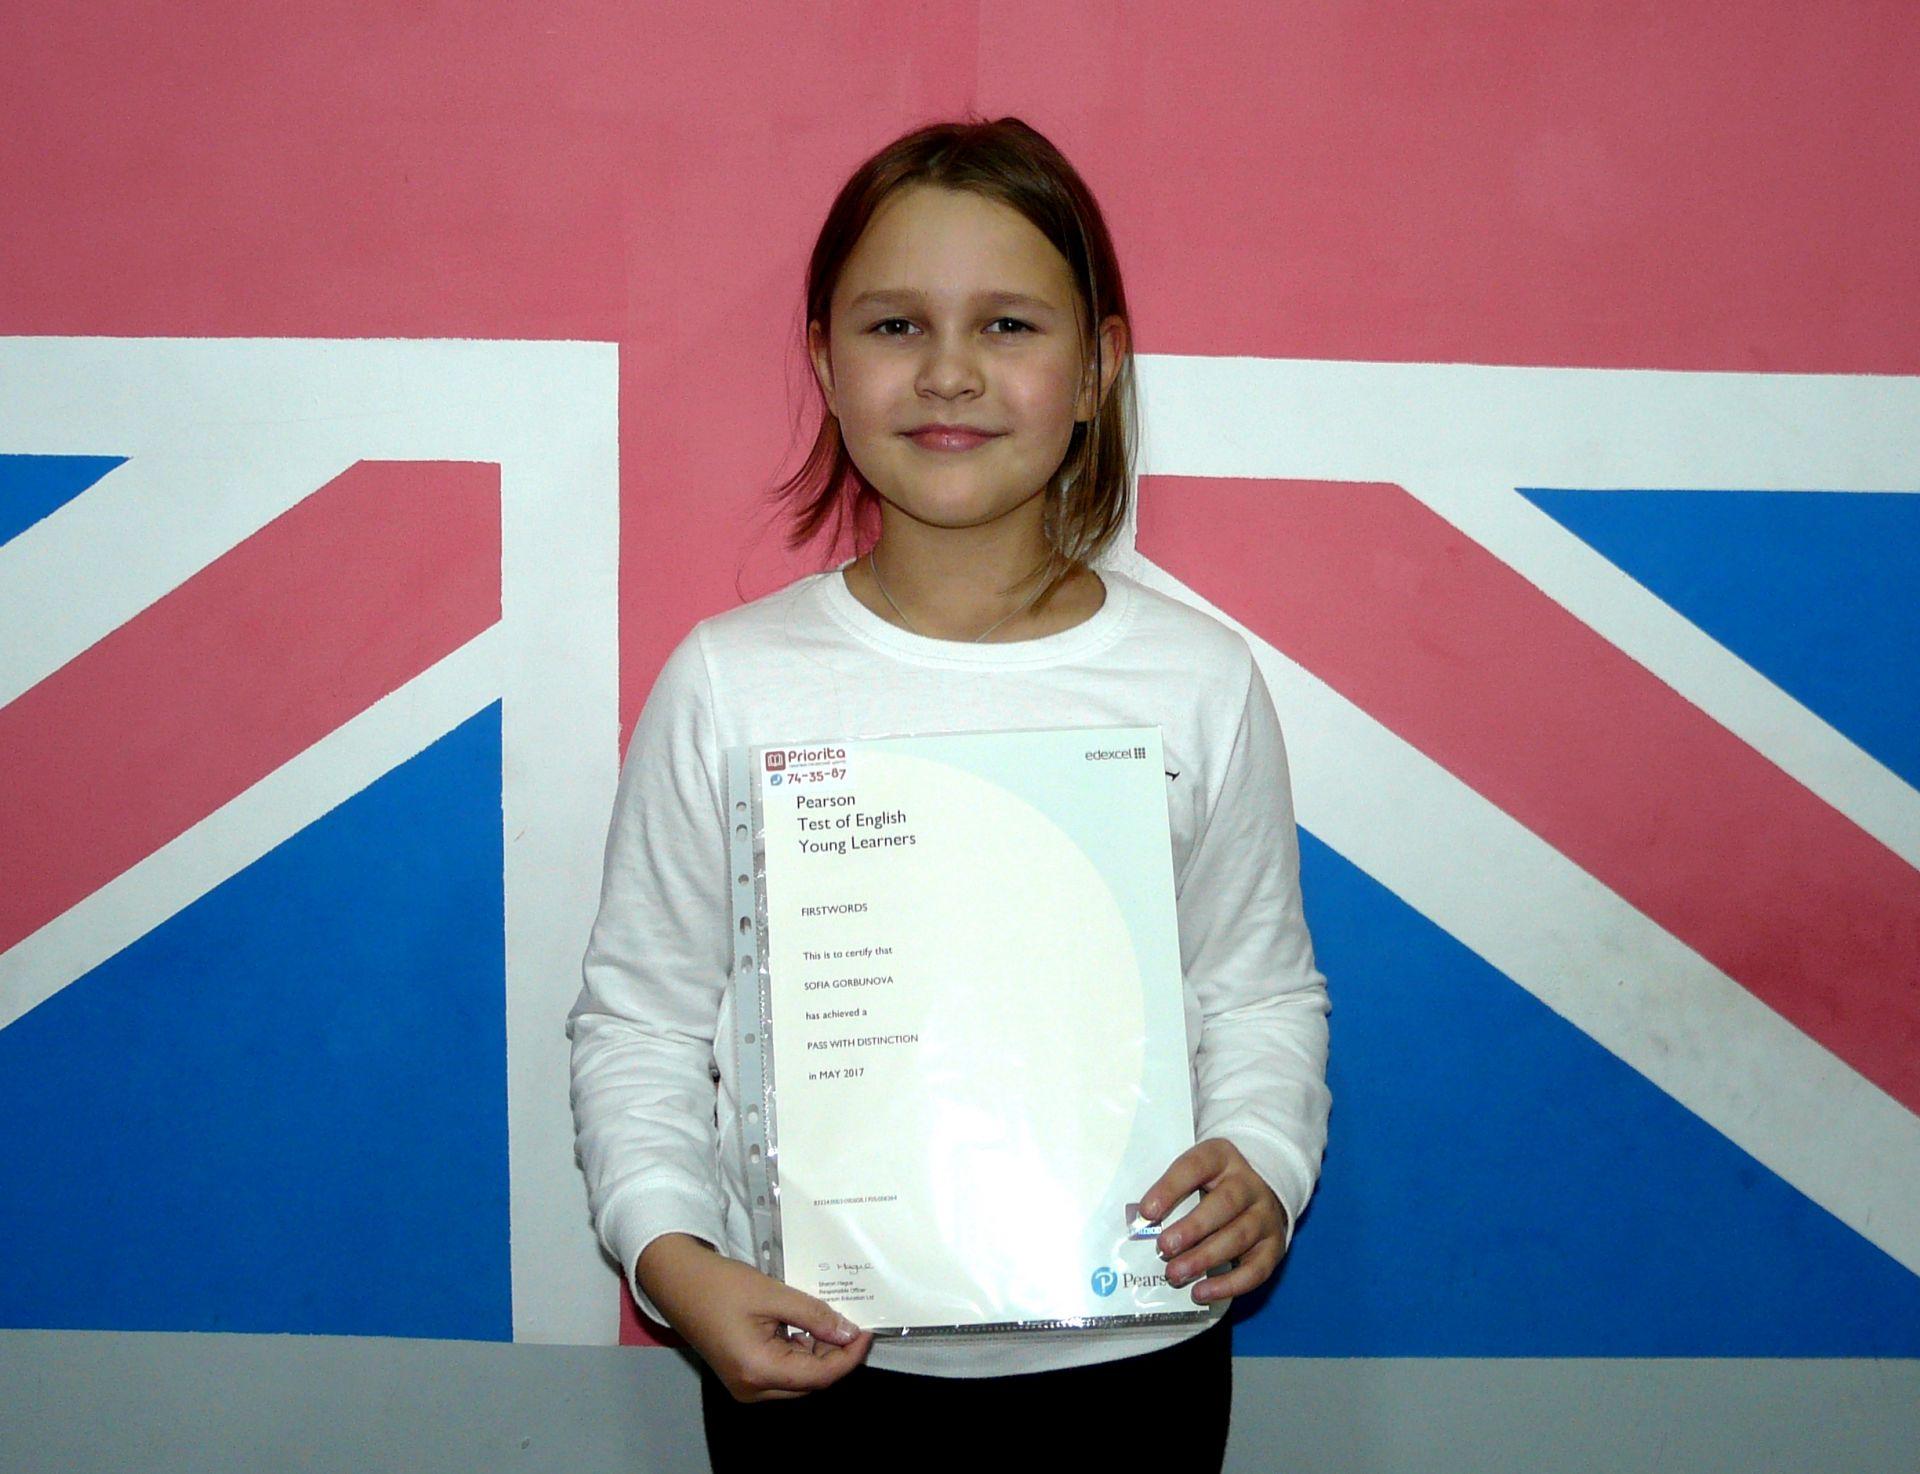 Горбунова Софья - экзамен PTE Young Learners Firstwords